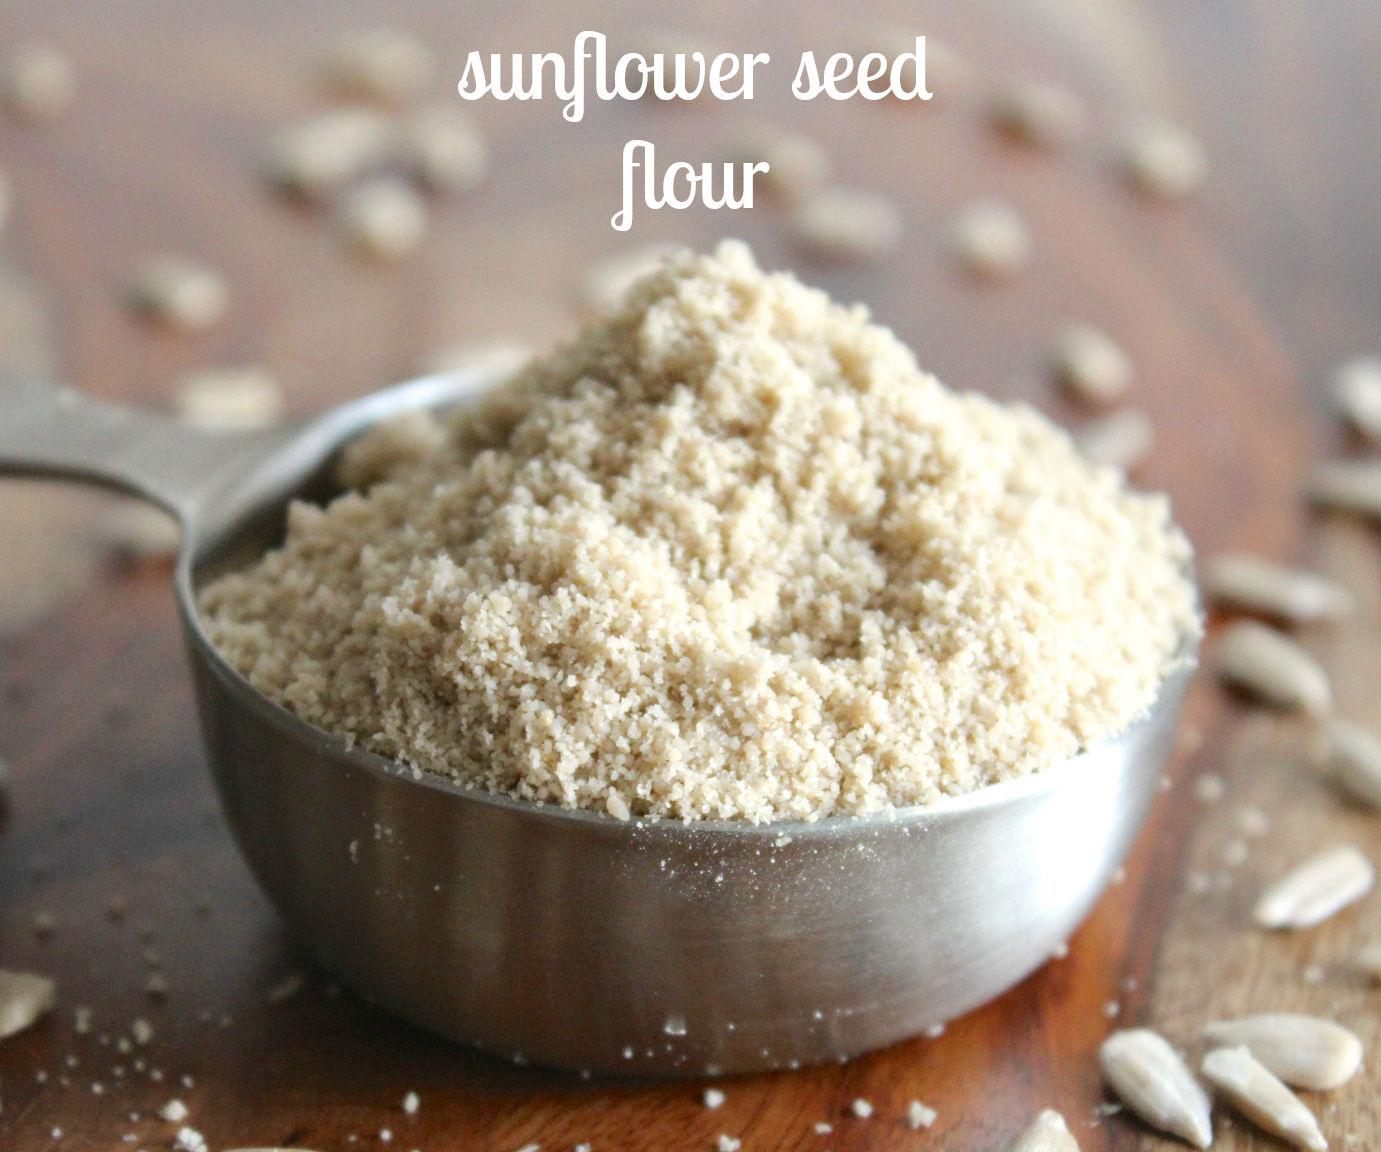 raw sunflower seed flour